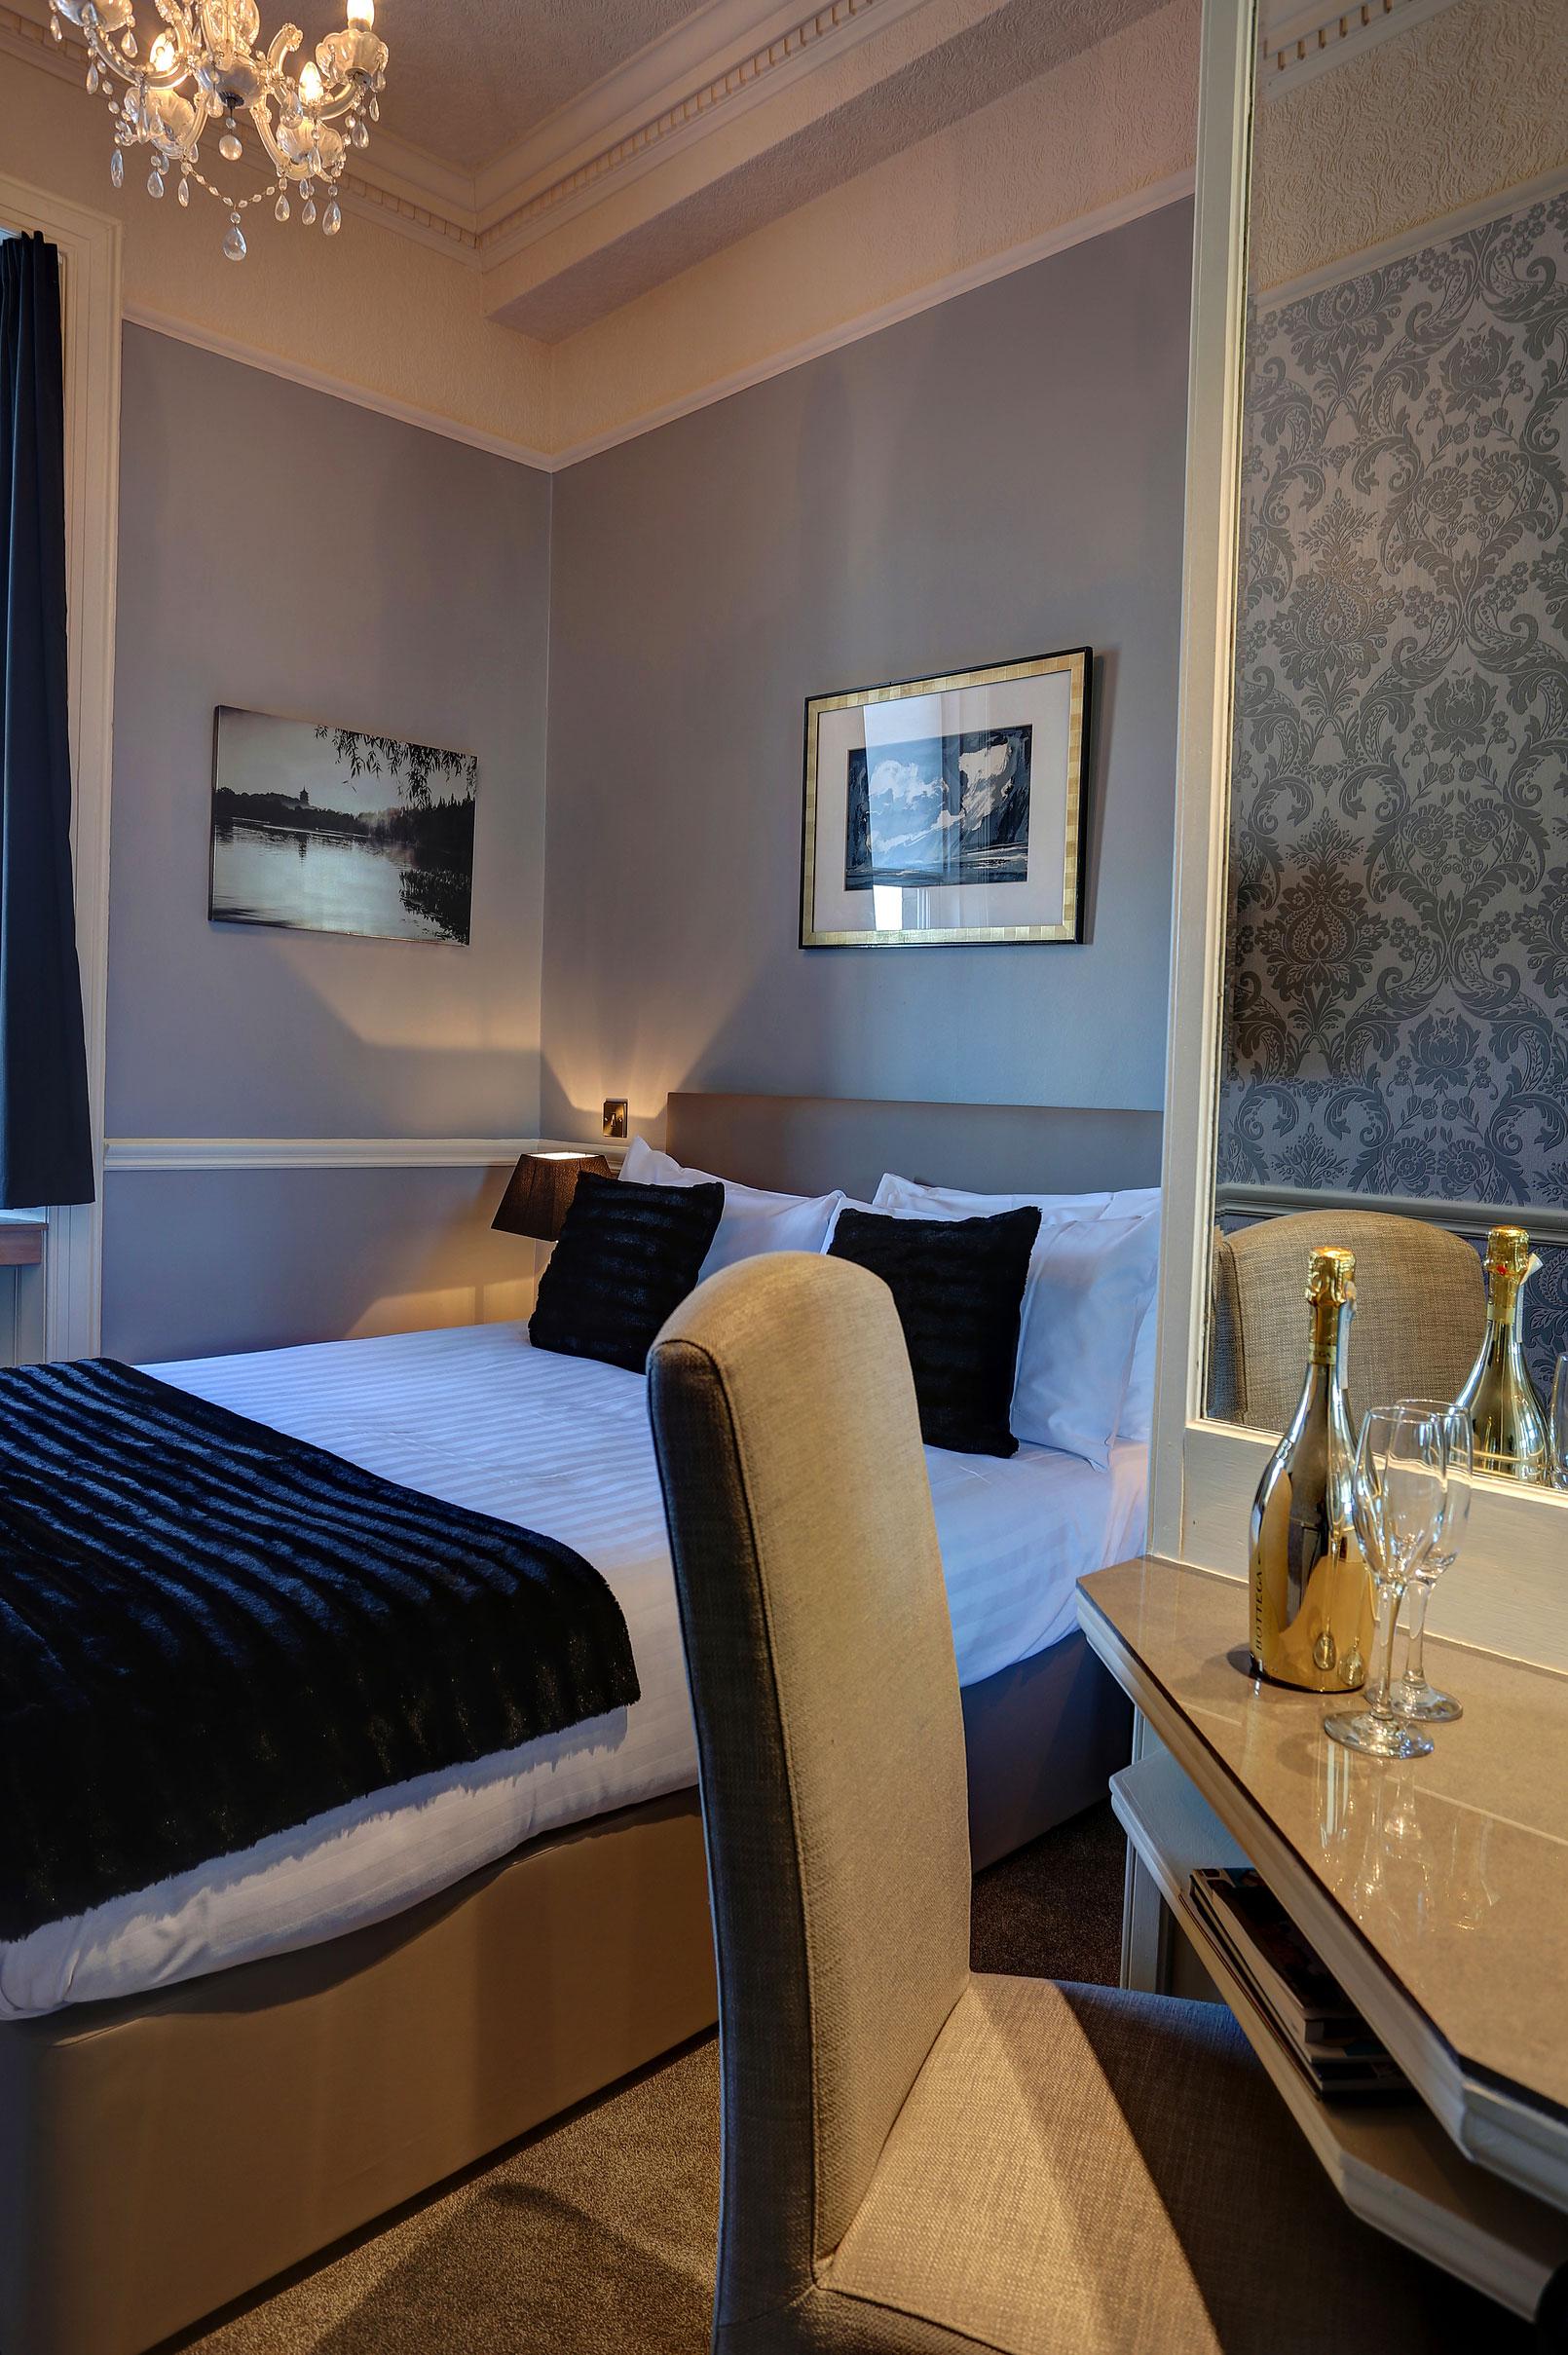 Best Western Hotel Room: Best Western Edinburgh South Braid Hills Hotel